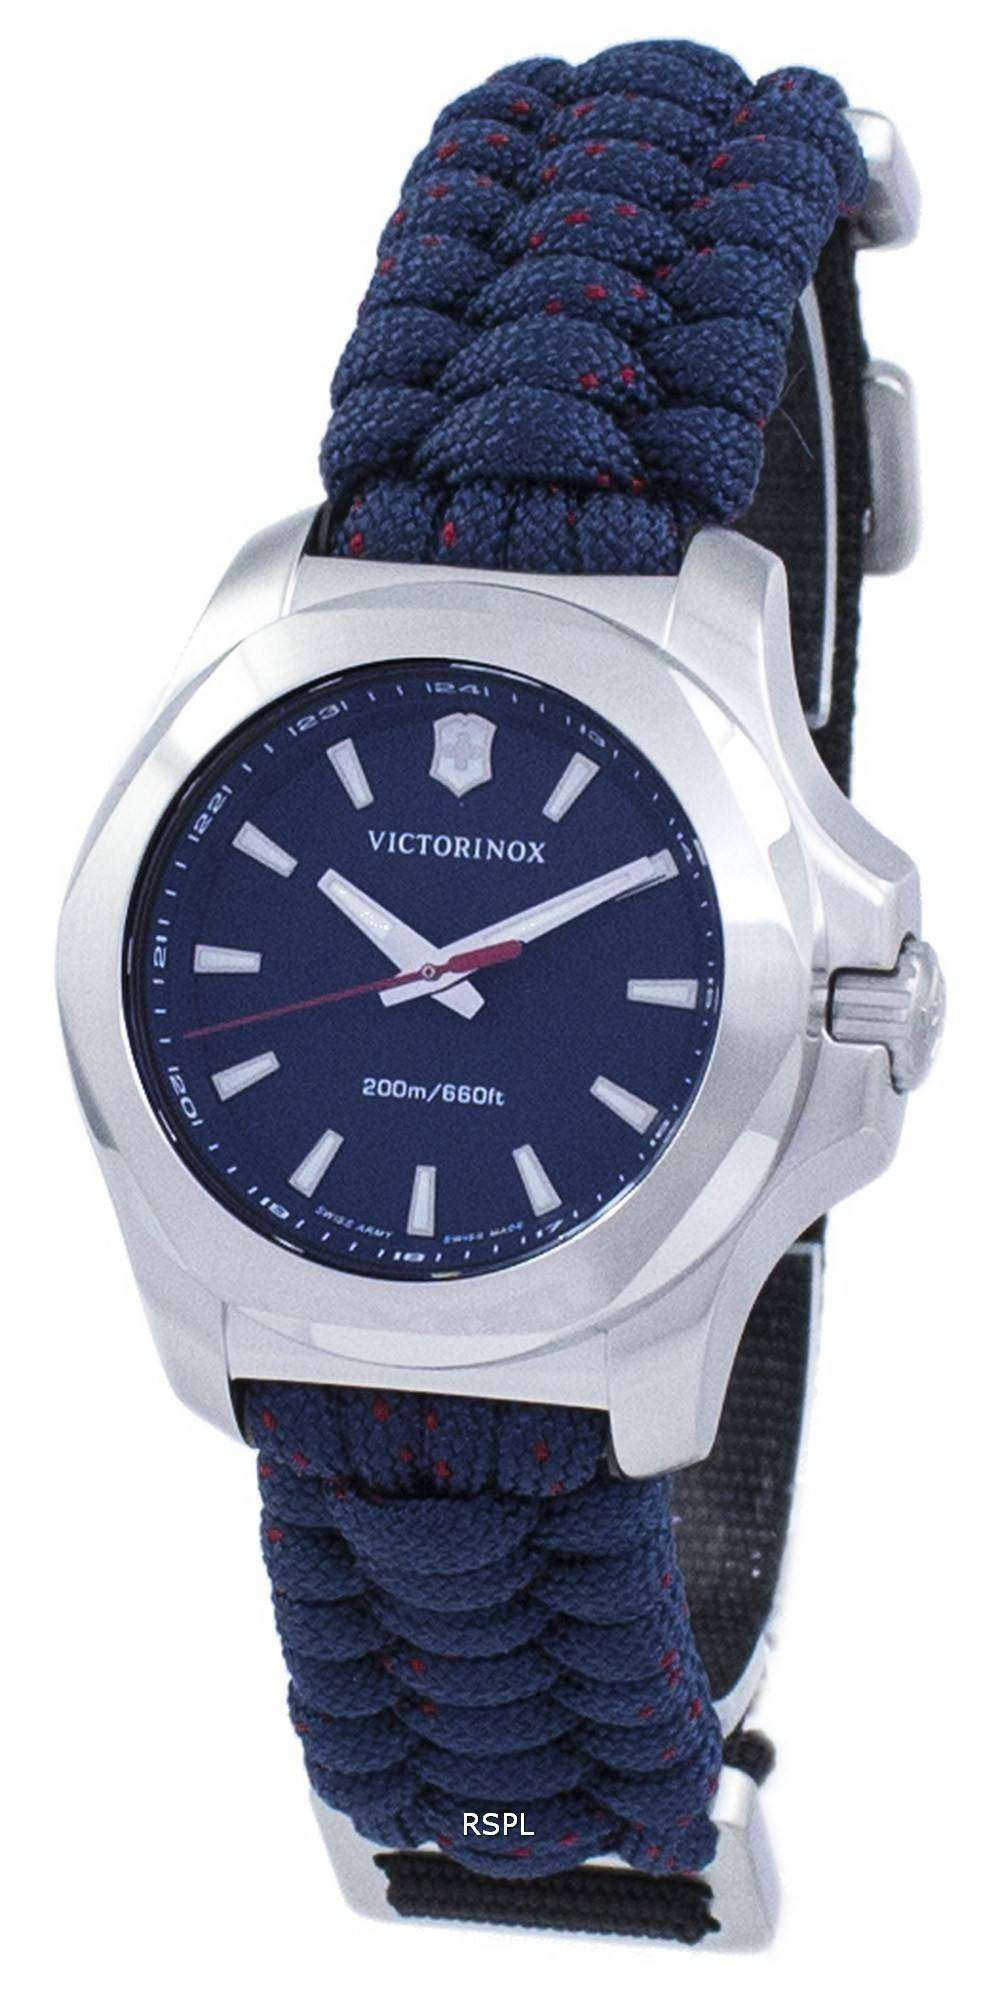 6ba3d7d89476 Victorinox I.N.O.X. V Swiss Army Quartz 200M 241770 Women s Watch ...